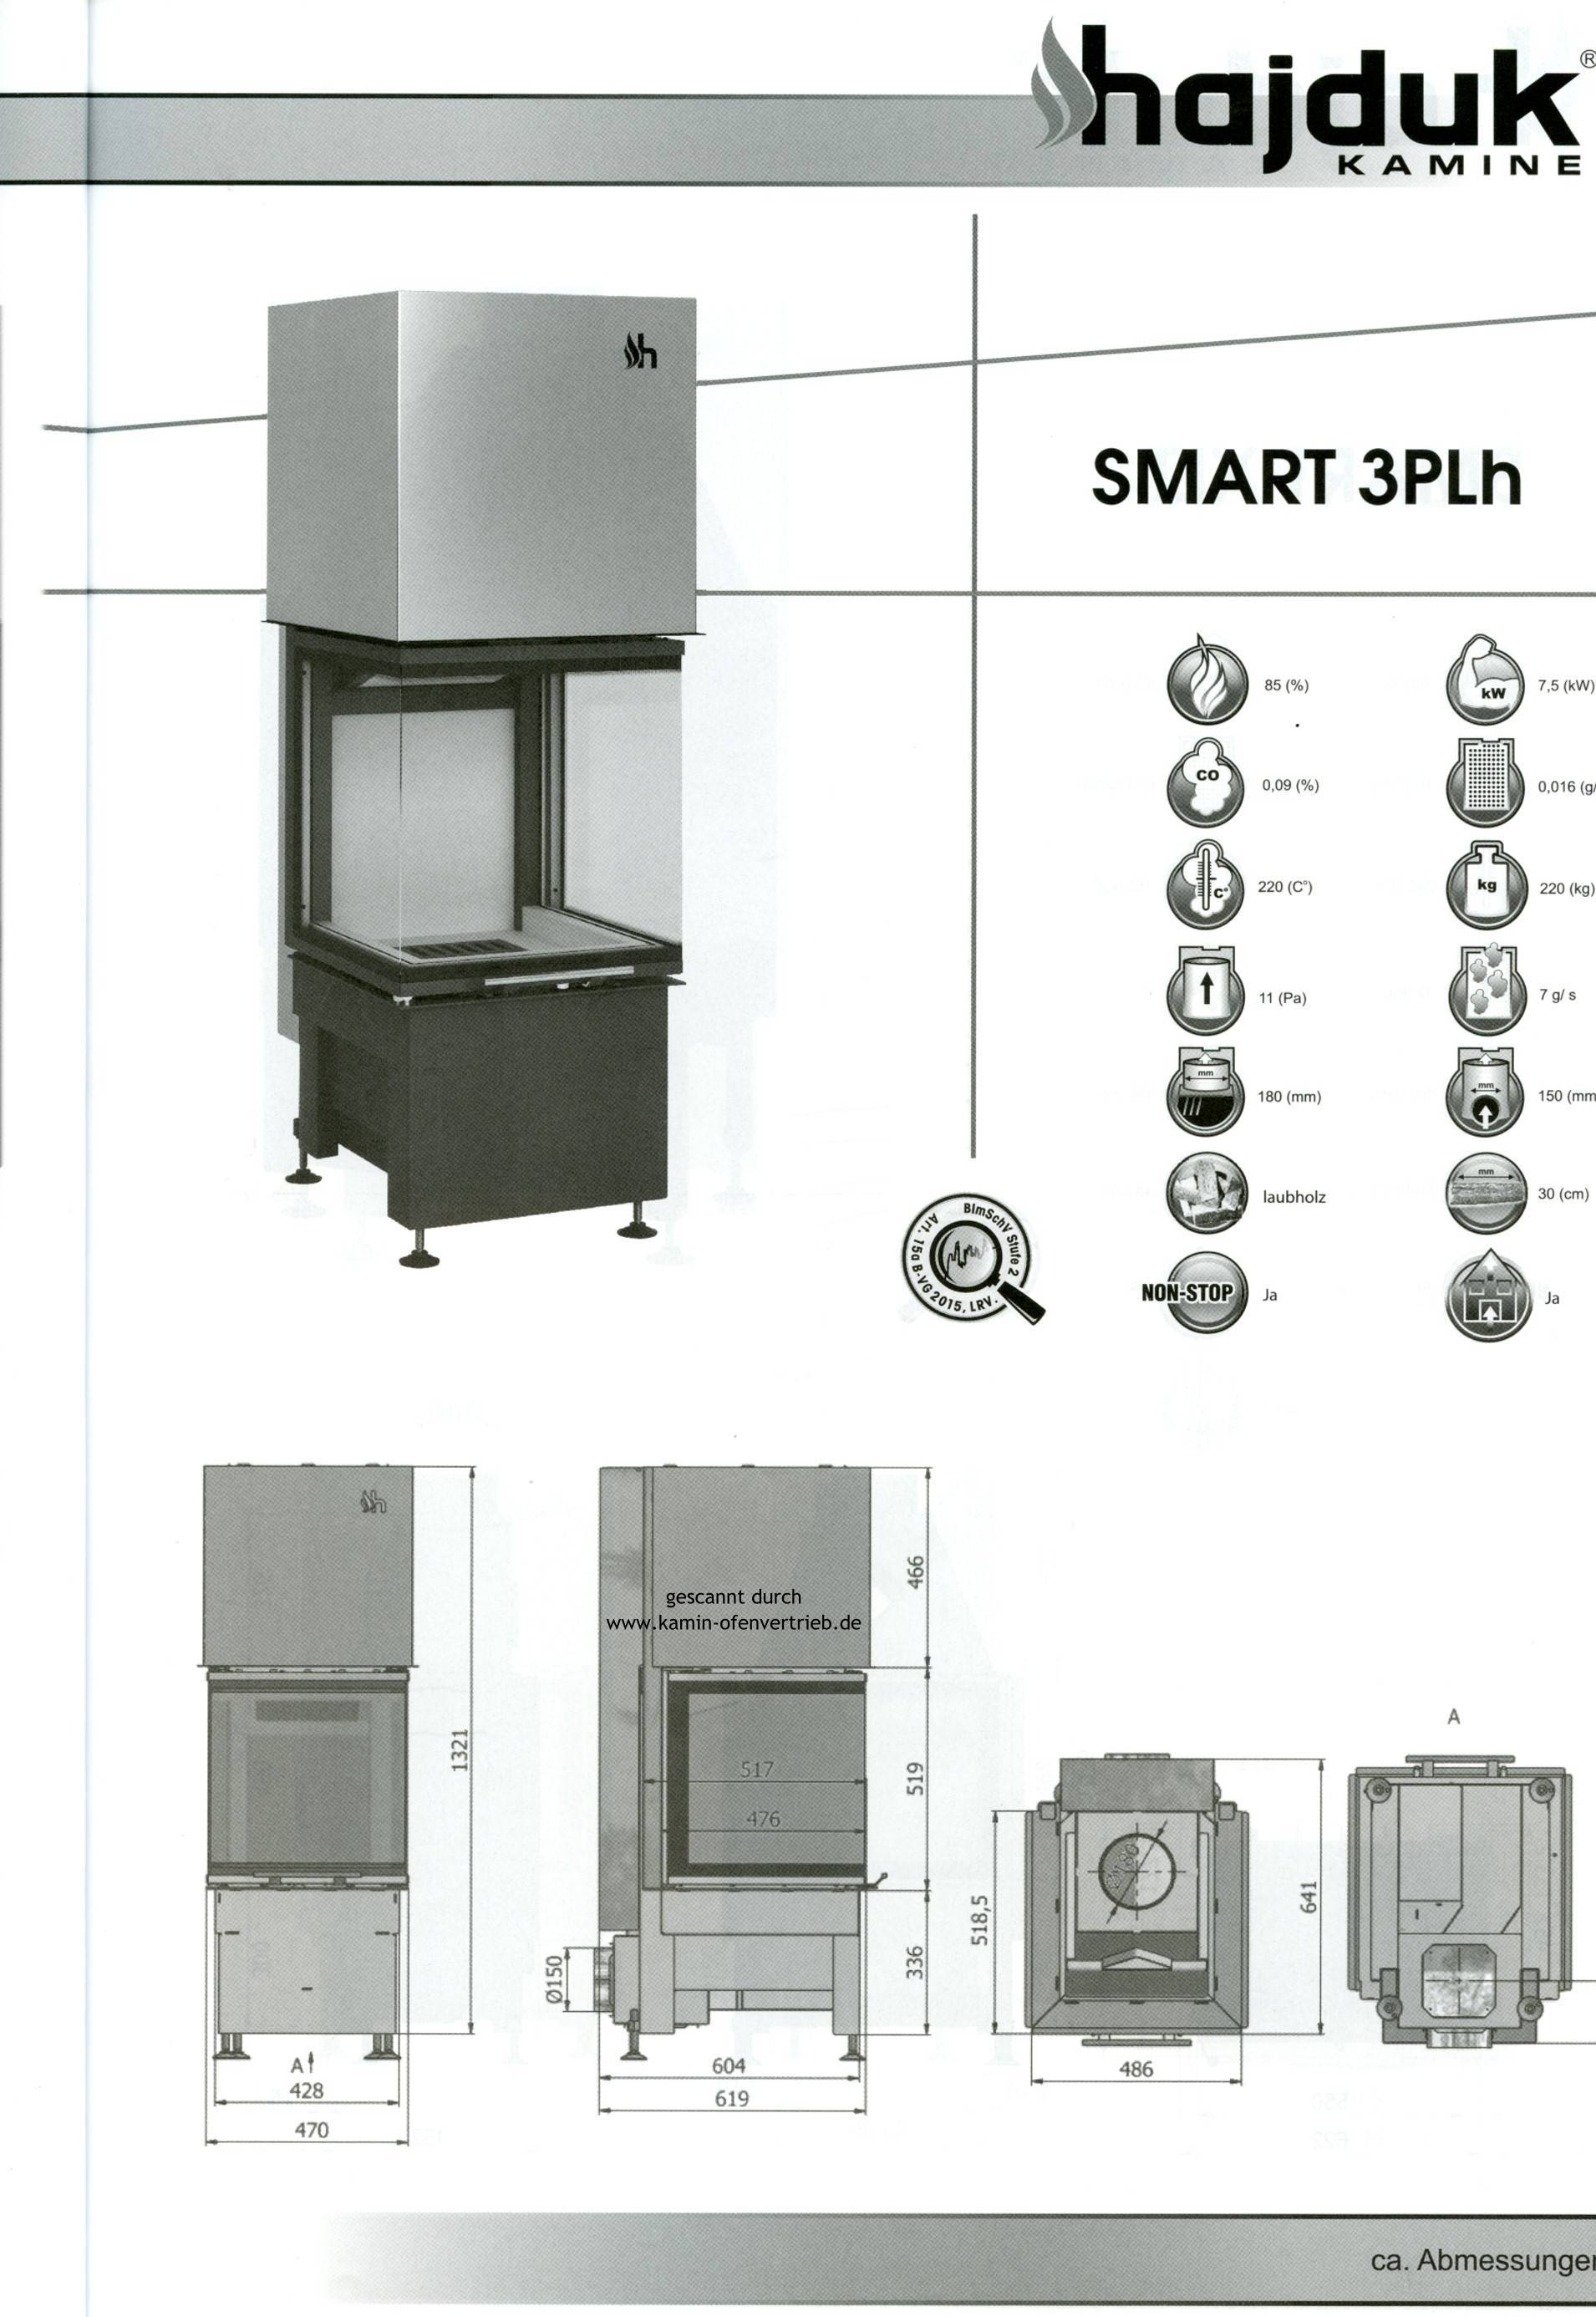 hajduk kamineinsatz smart 3plh preis ab 2445 eur qualit t. Black Bedroom Furniture Sets. Home Design Ideas